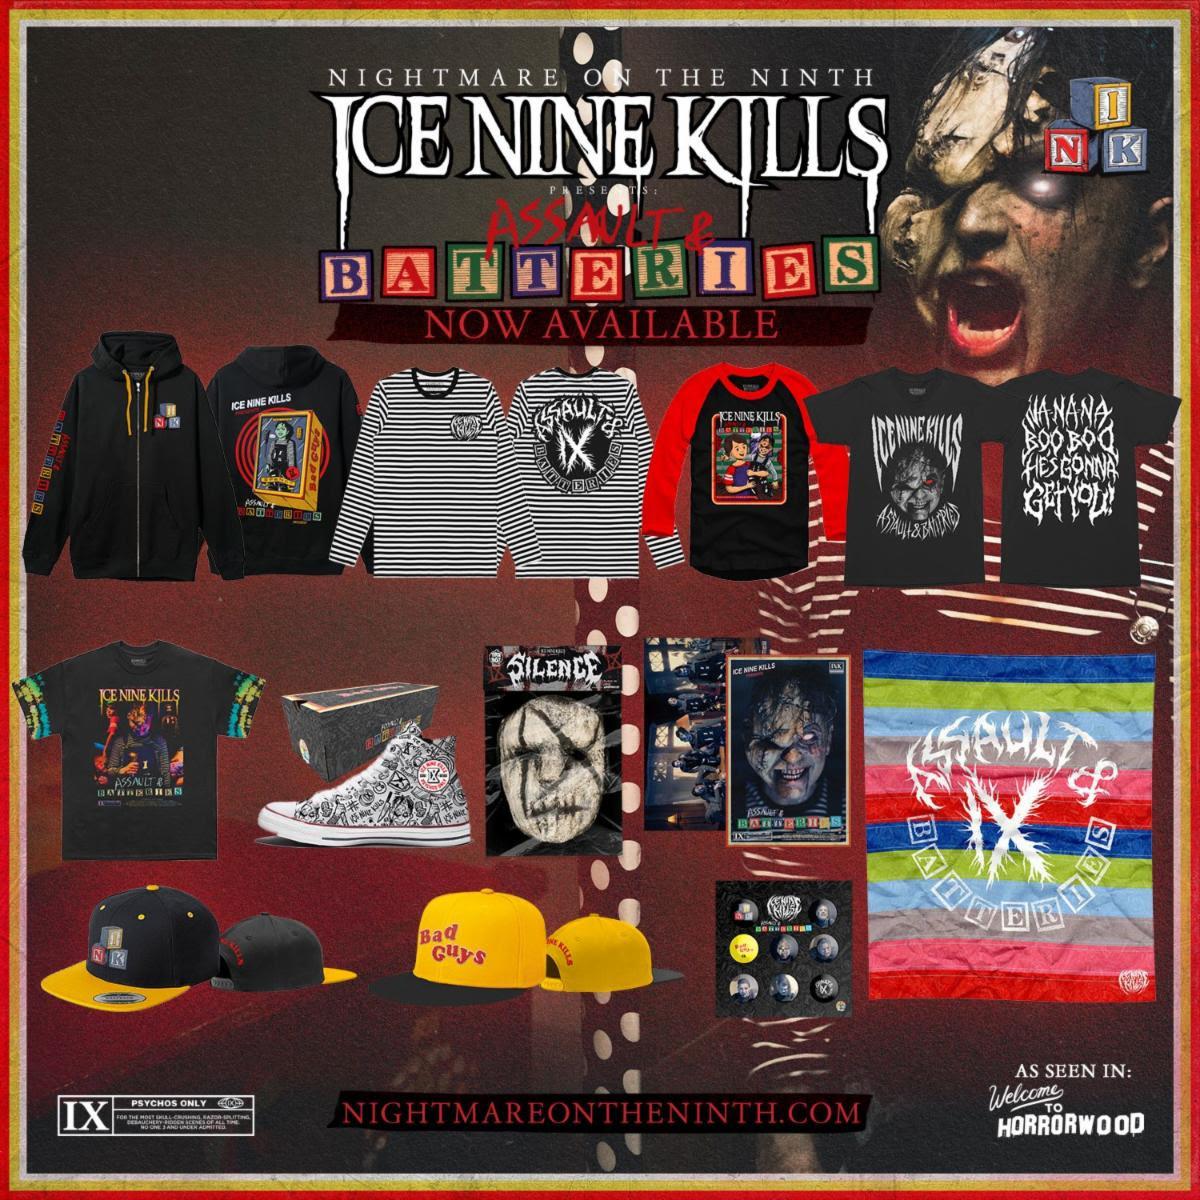 Ice Nine Kills Assault & Batteries merch